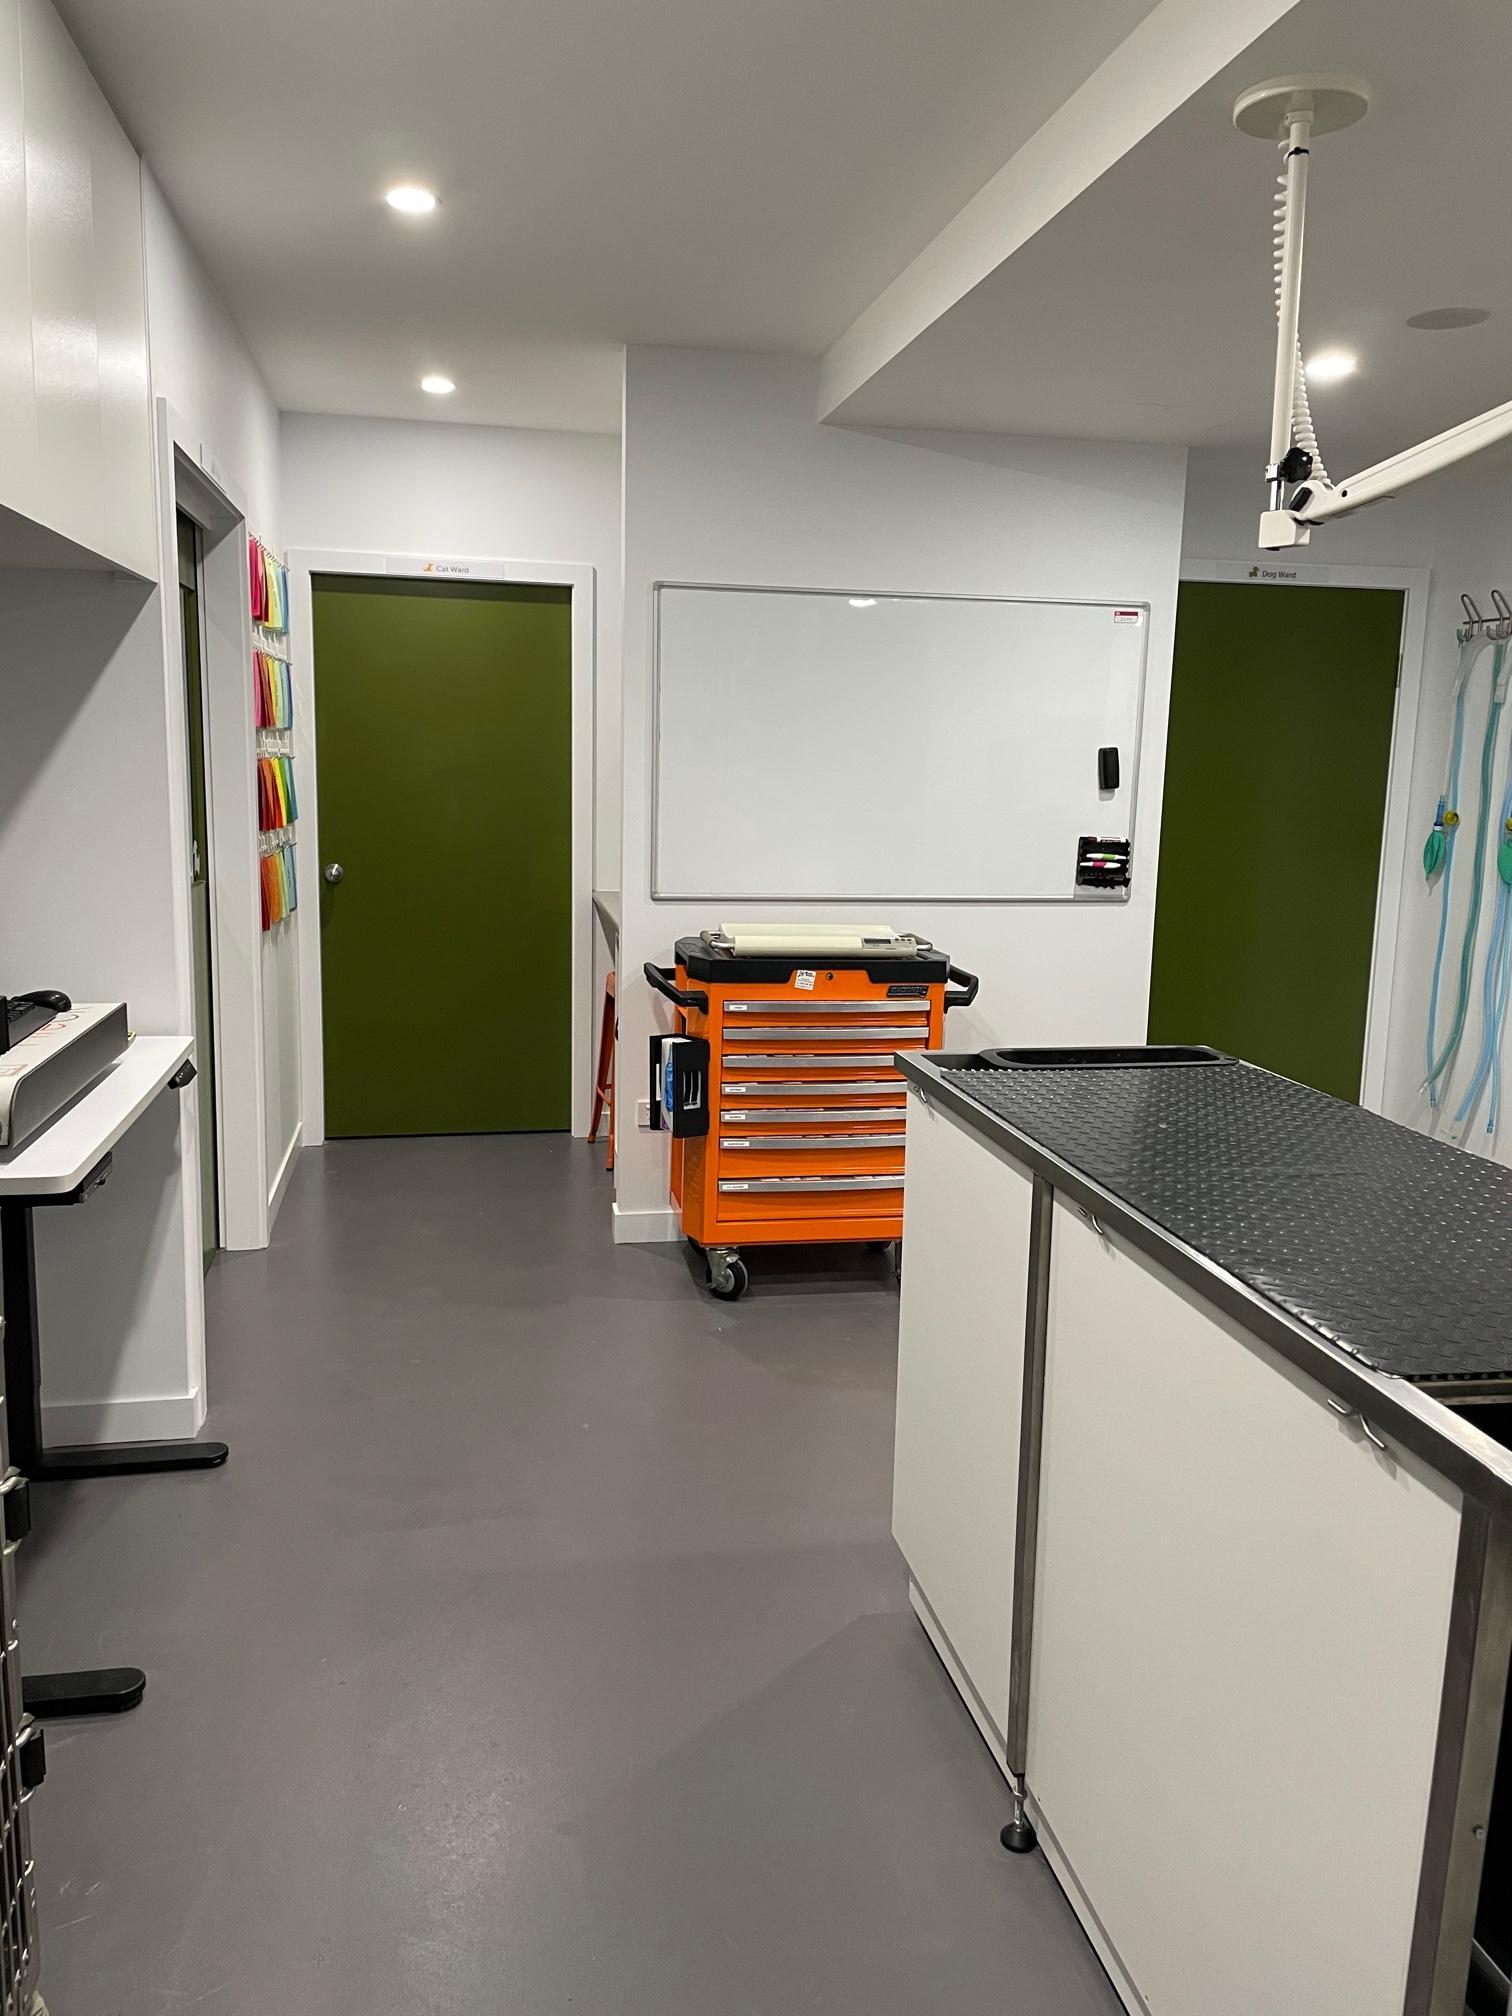 Downstairs Prep Area